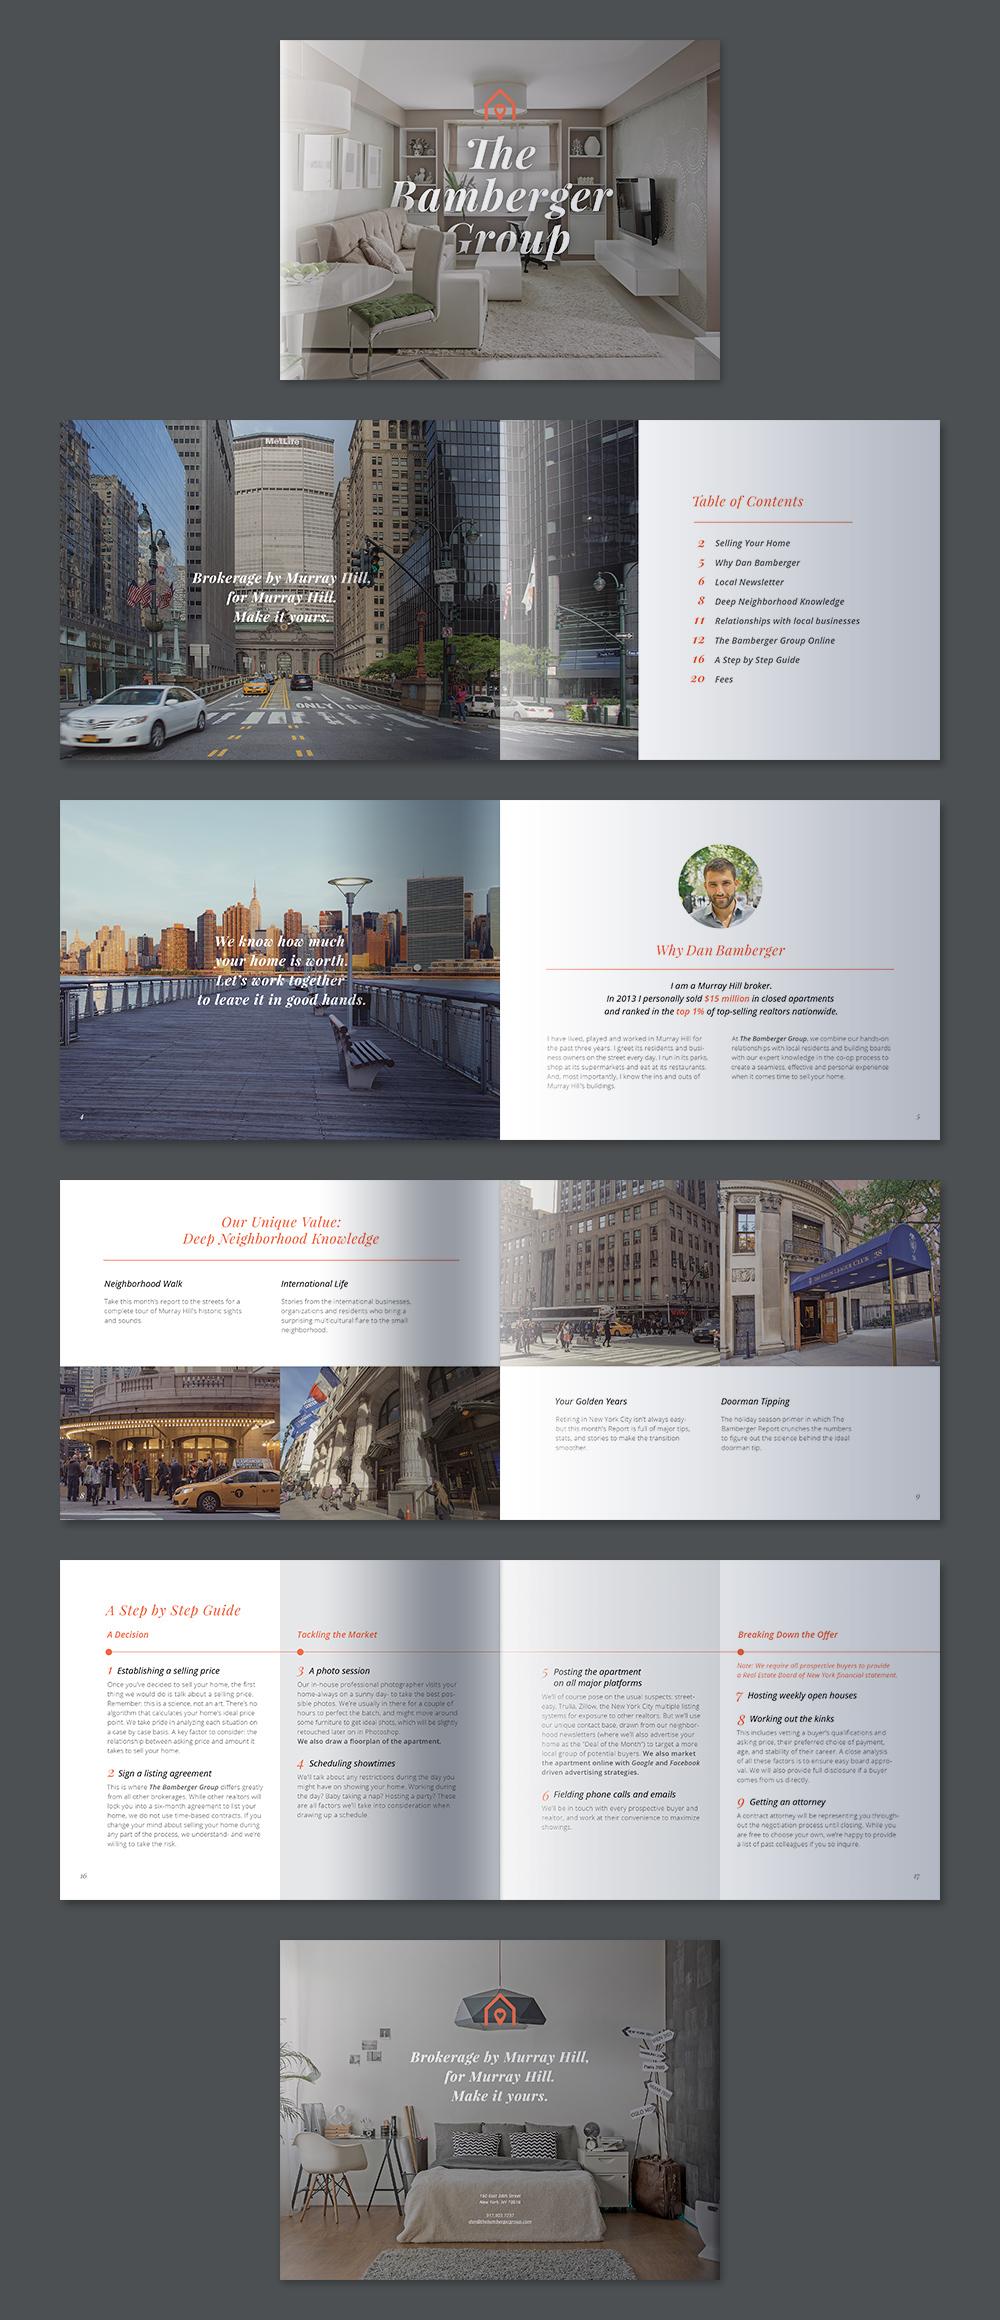 bamberger group realtor agency brochures design